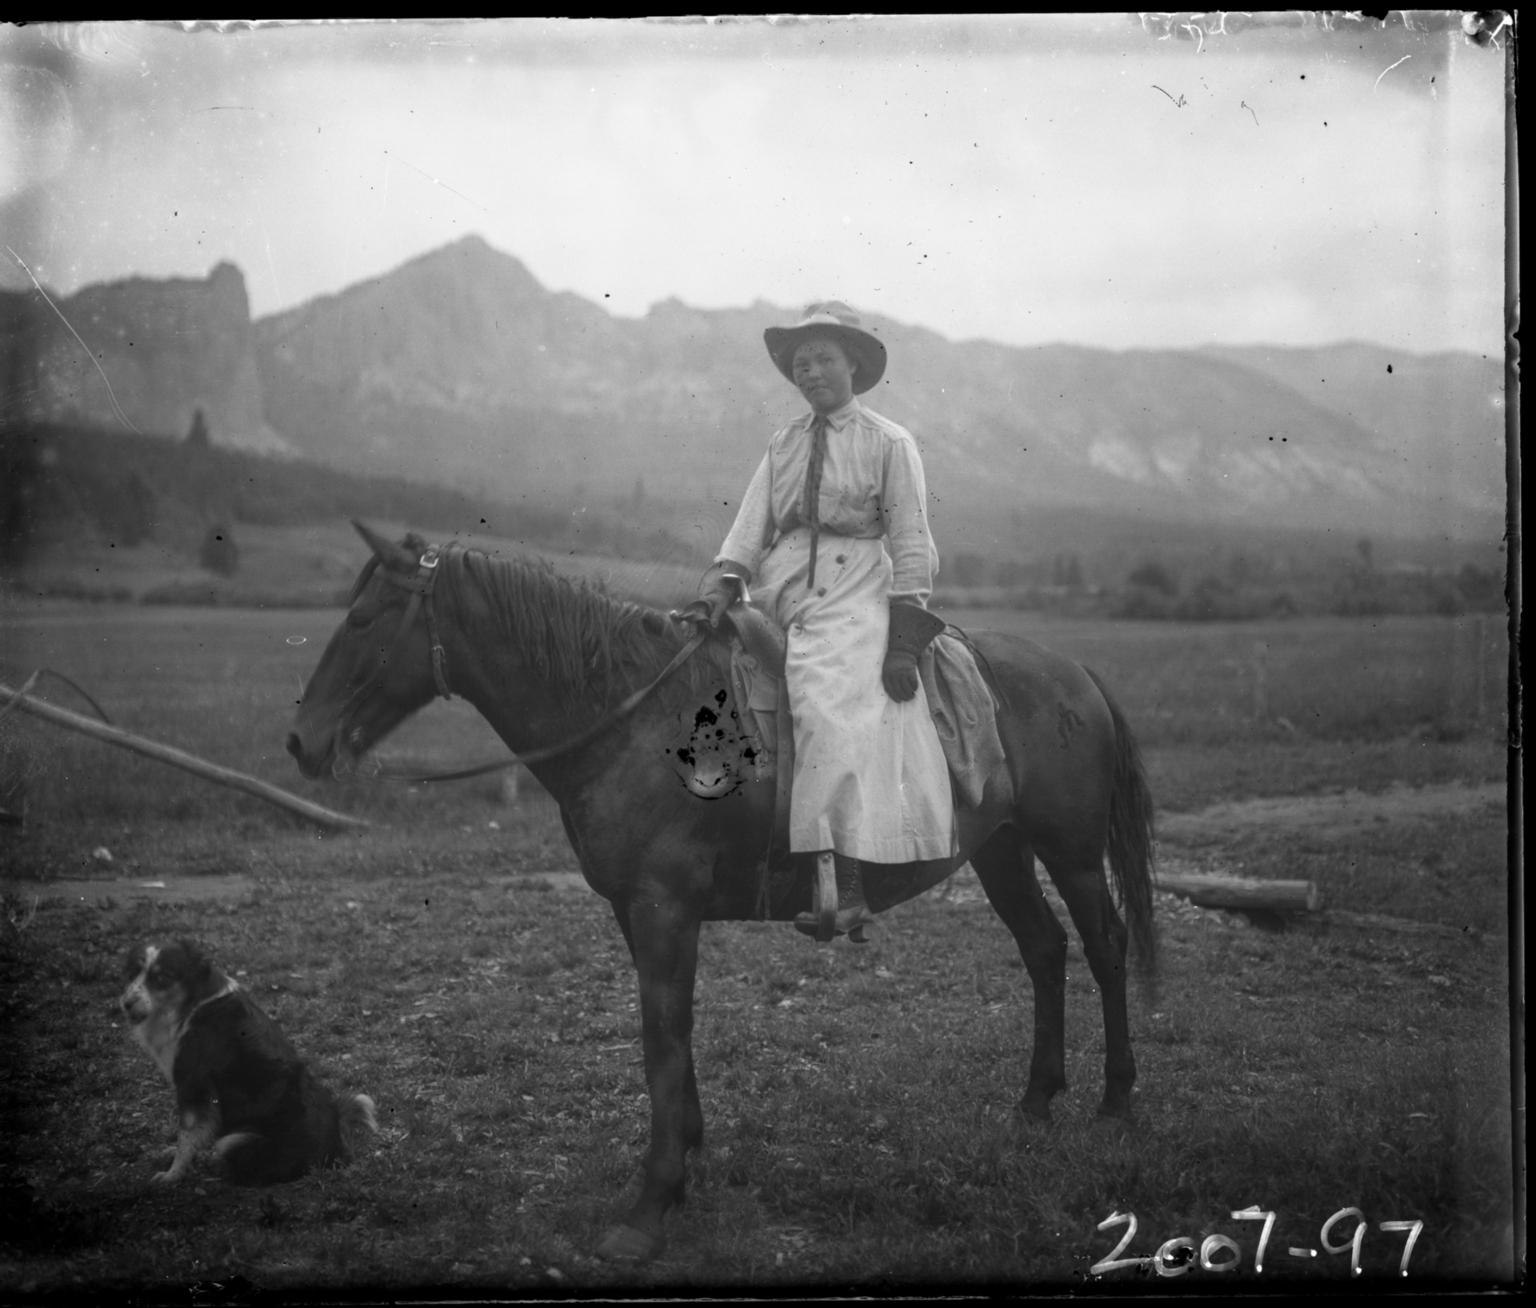 Man on horseback